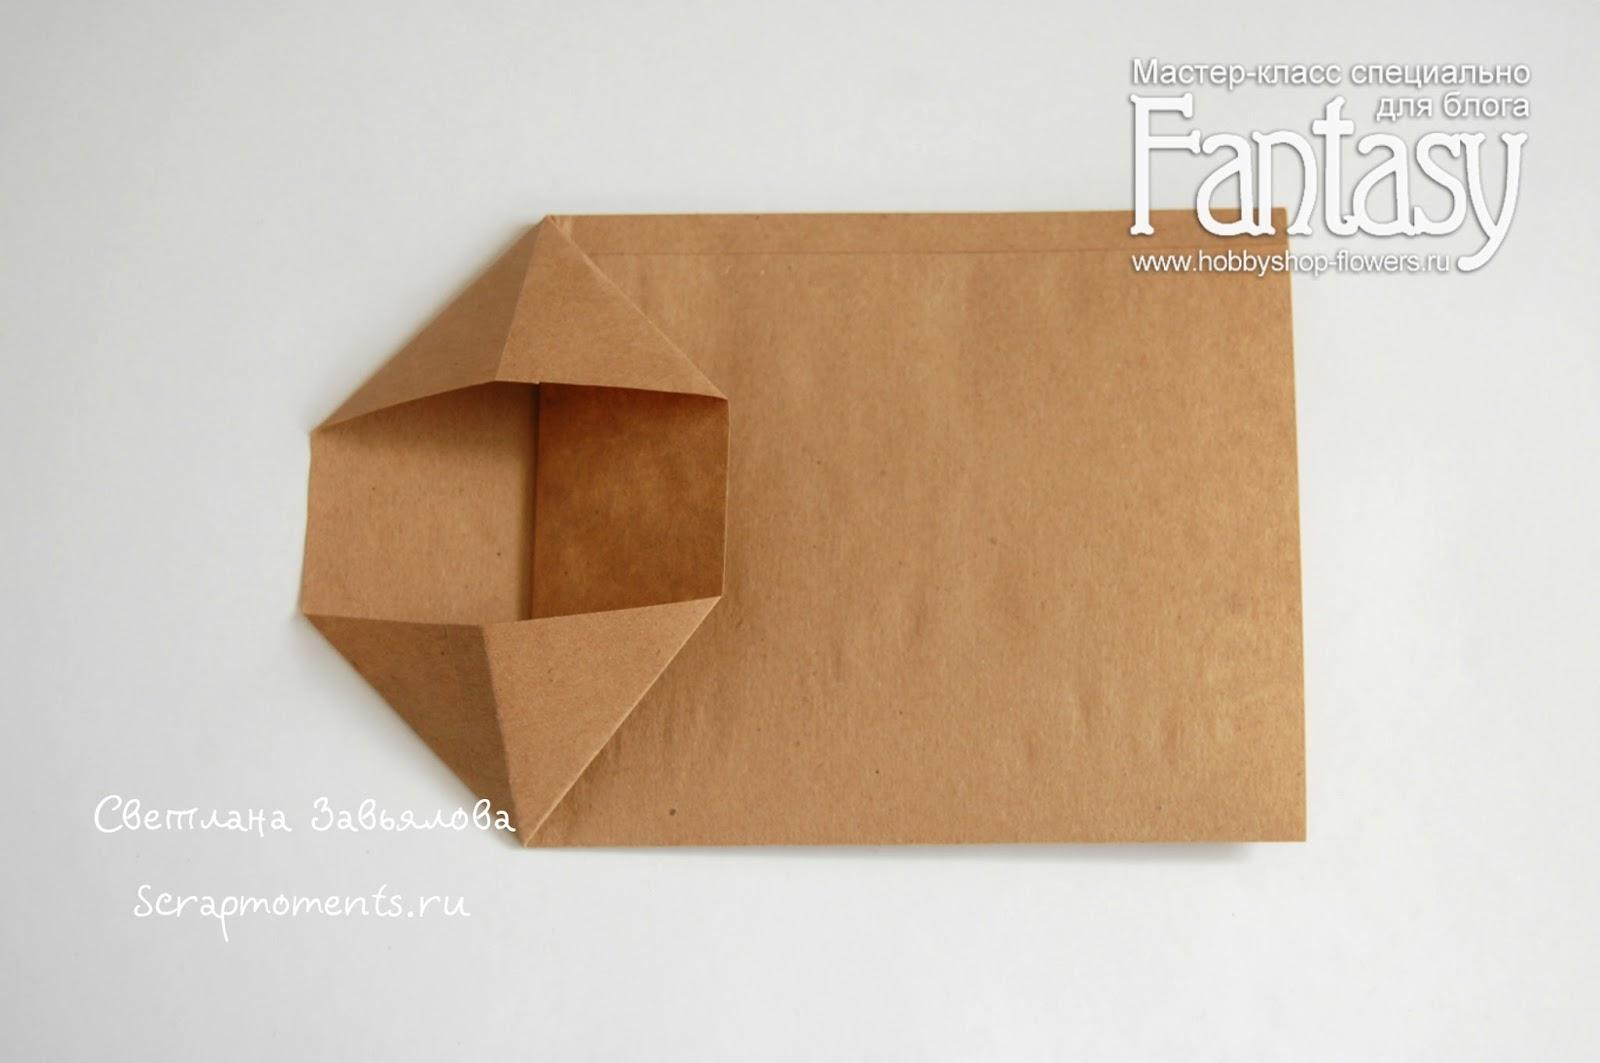 Упаковка из листа бумаги